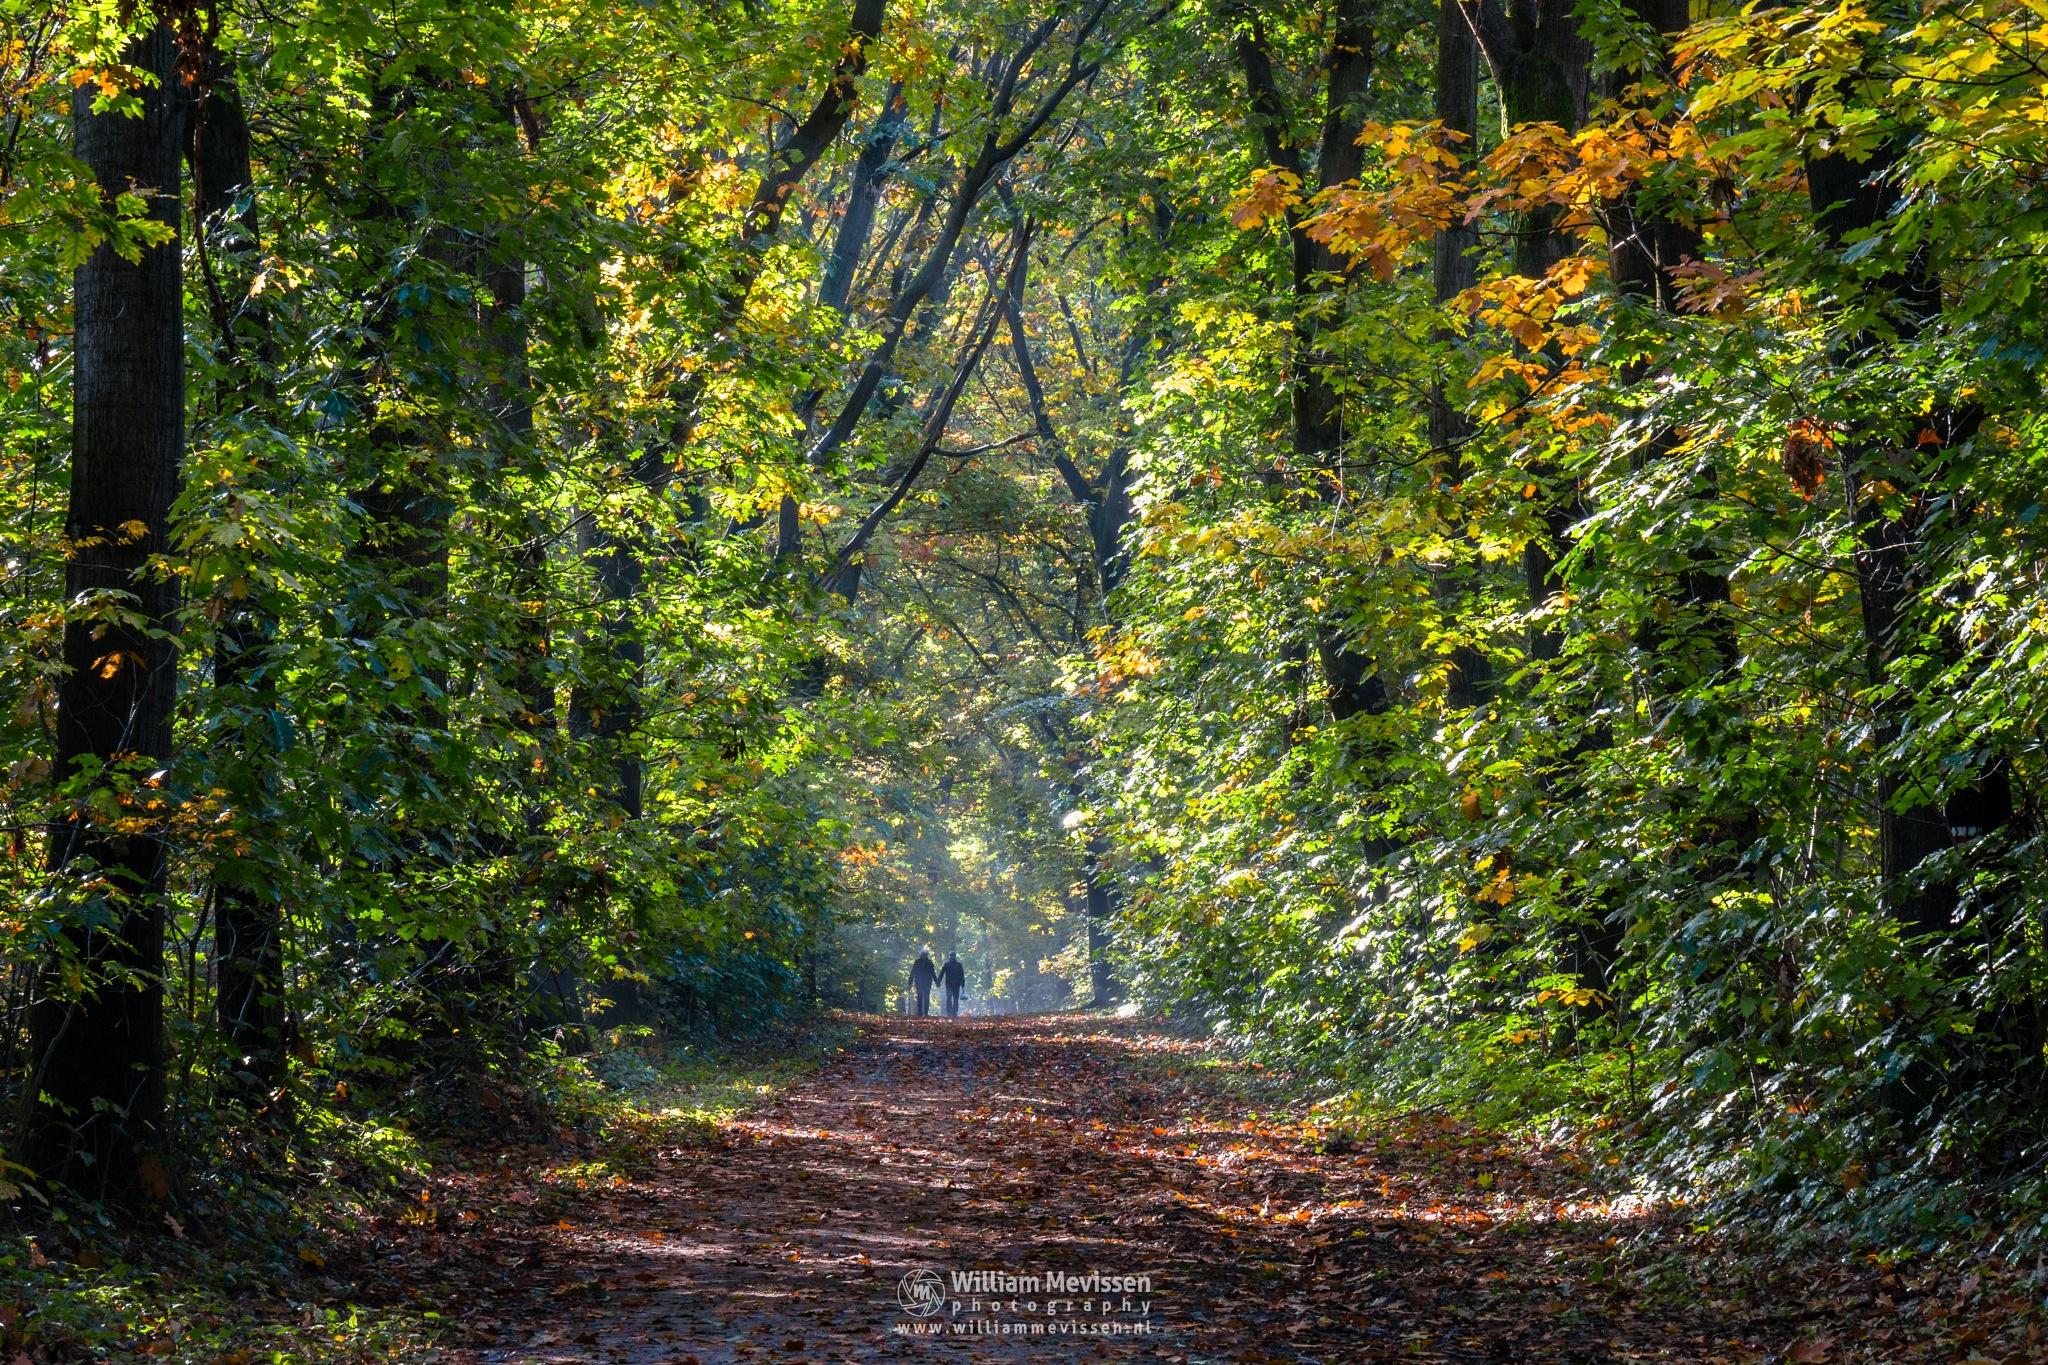 Enjoying Autumn by William Mevissen